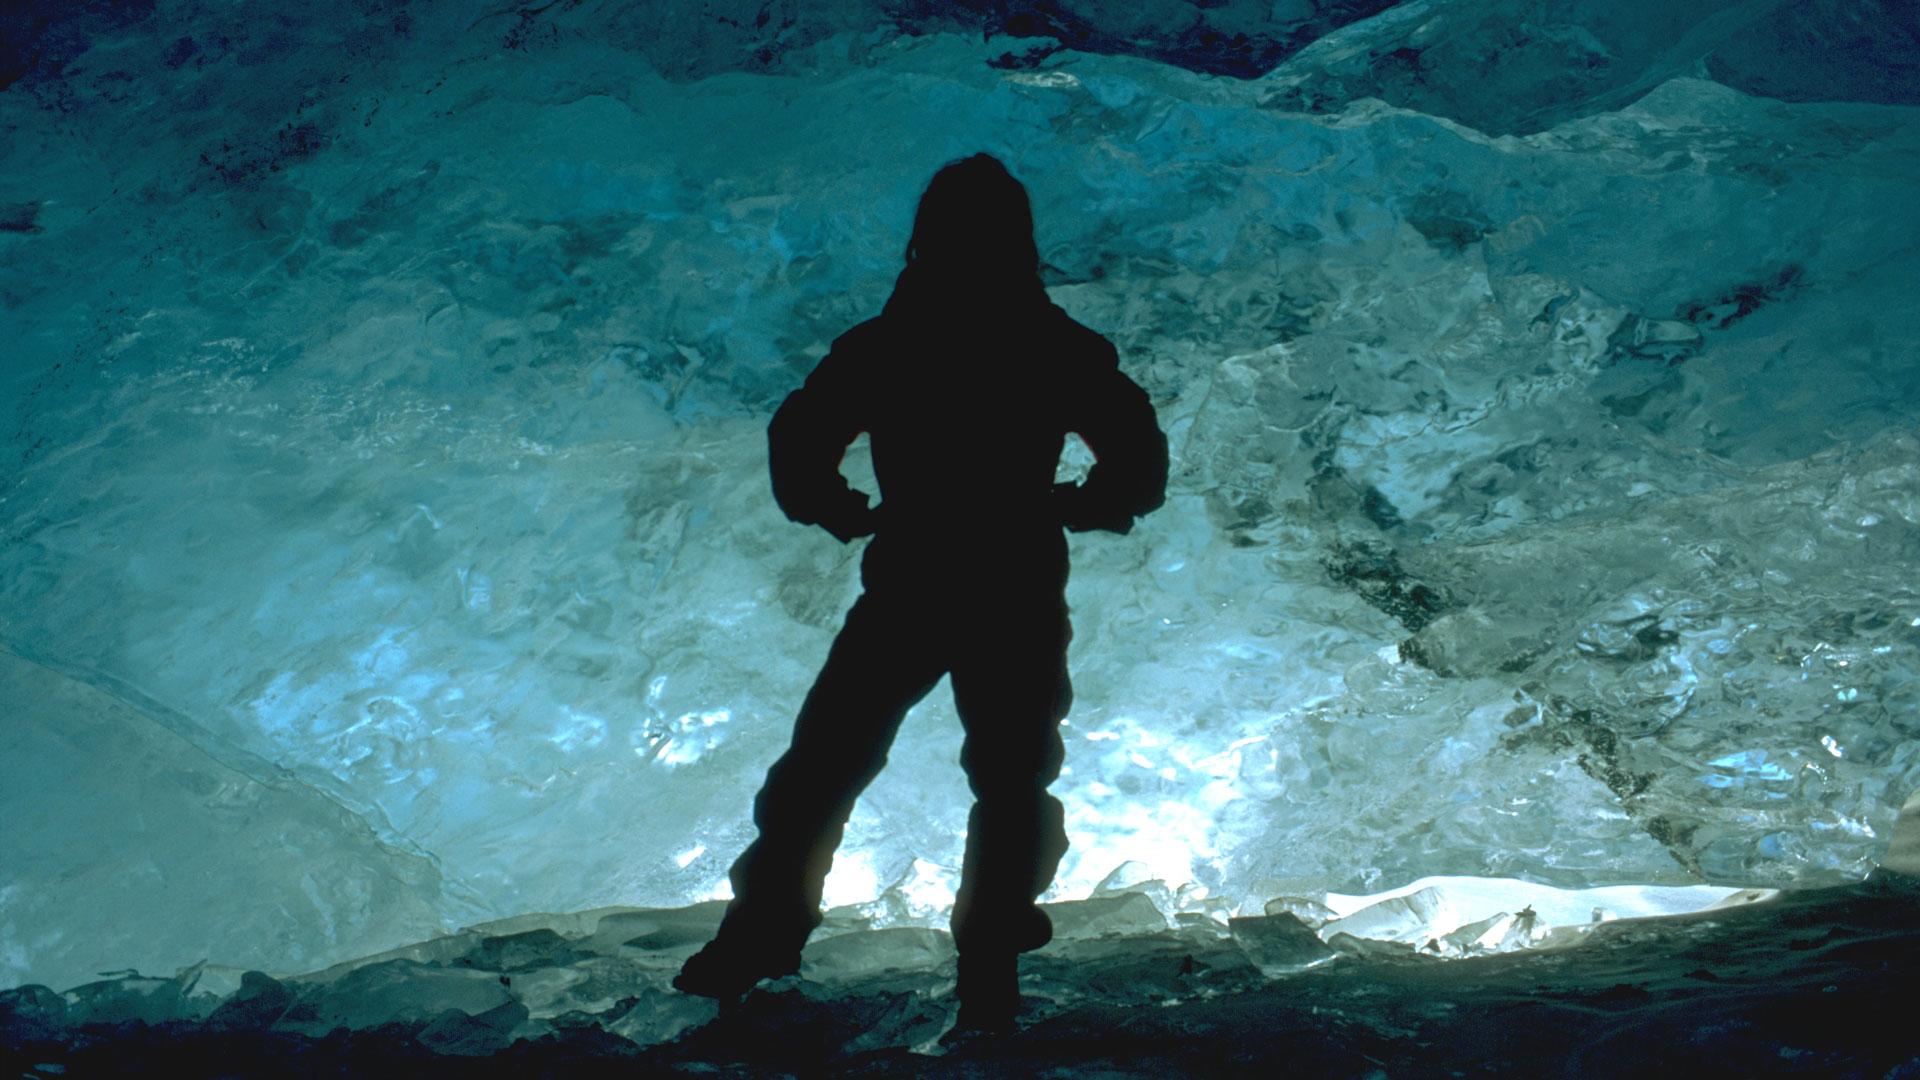 The Vanishing Ice